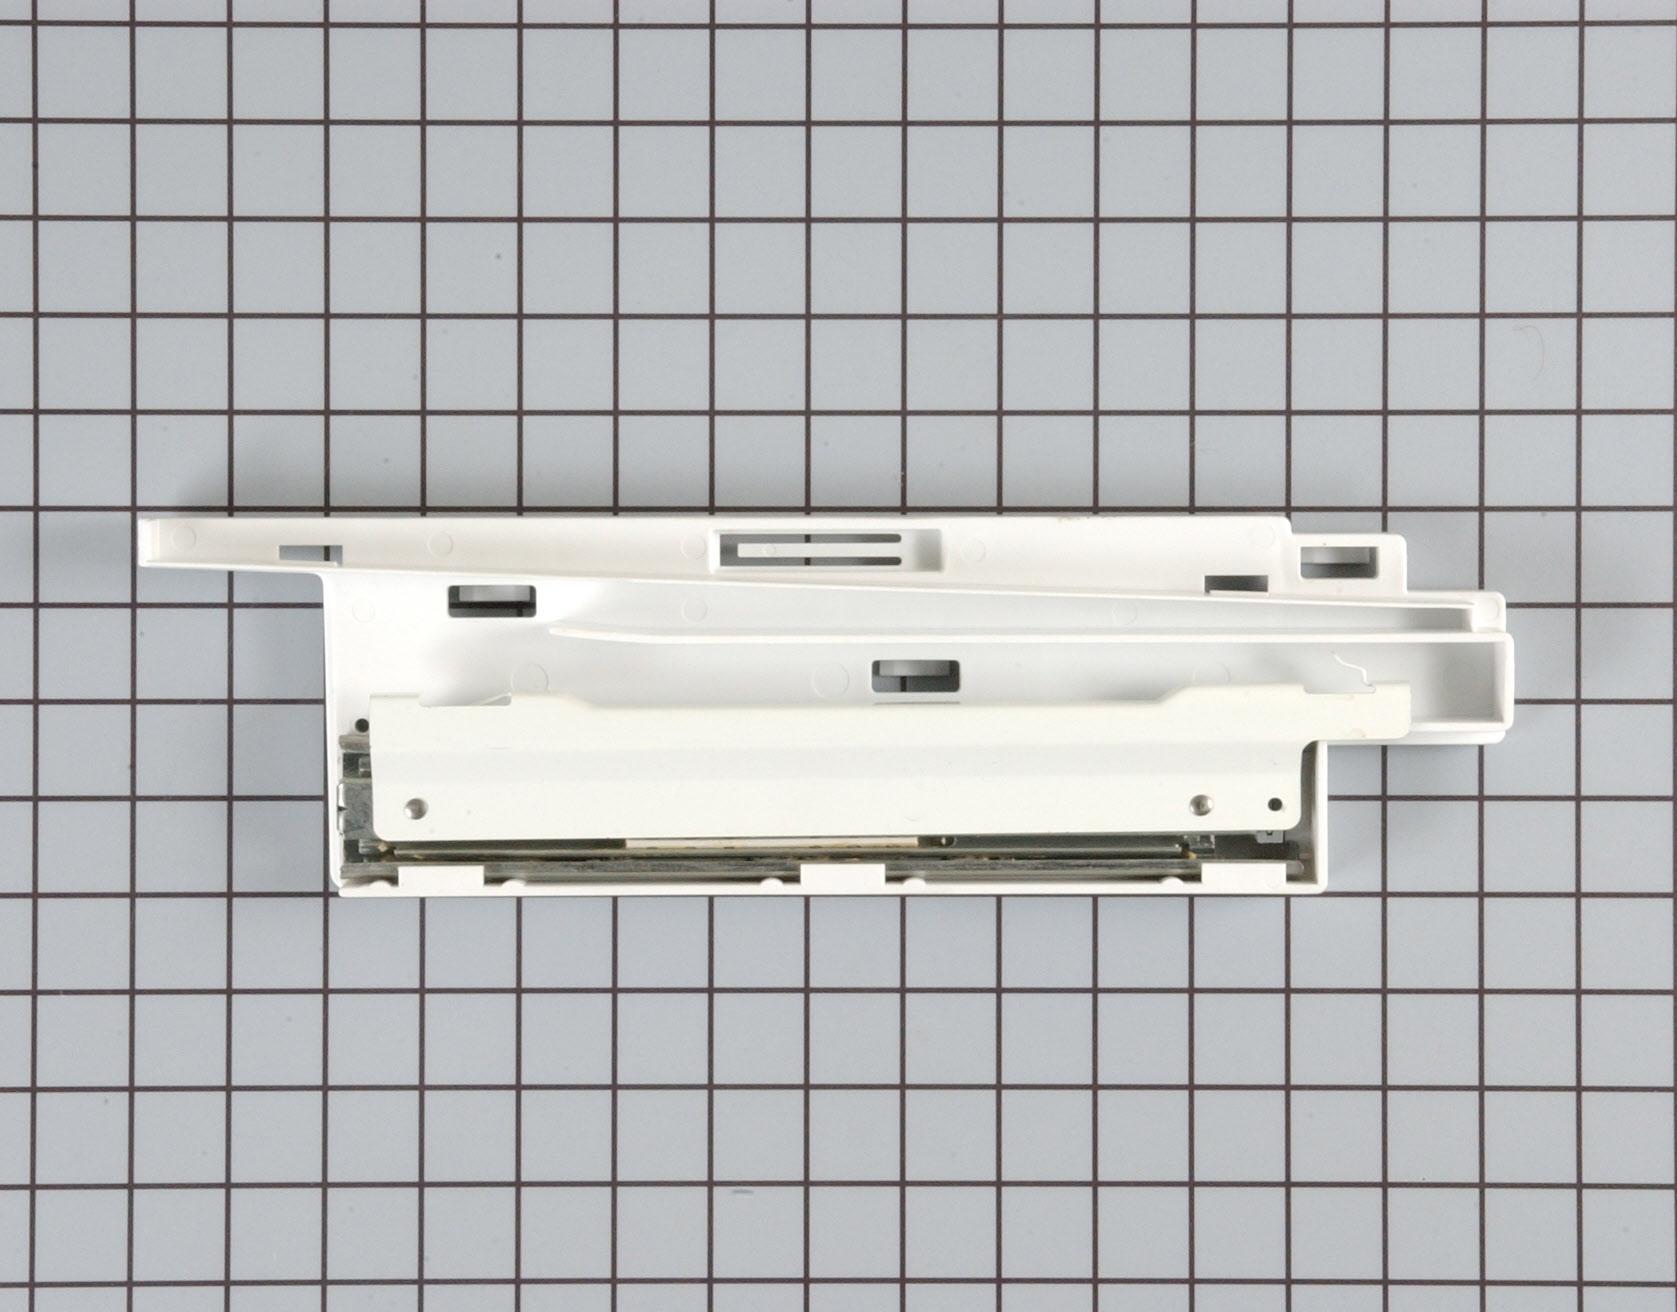 KitchenAid Refrigerator Part # WP2301570 - Drawer Slide Rail